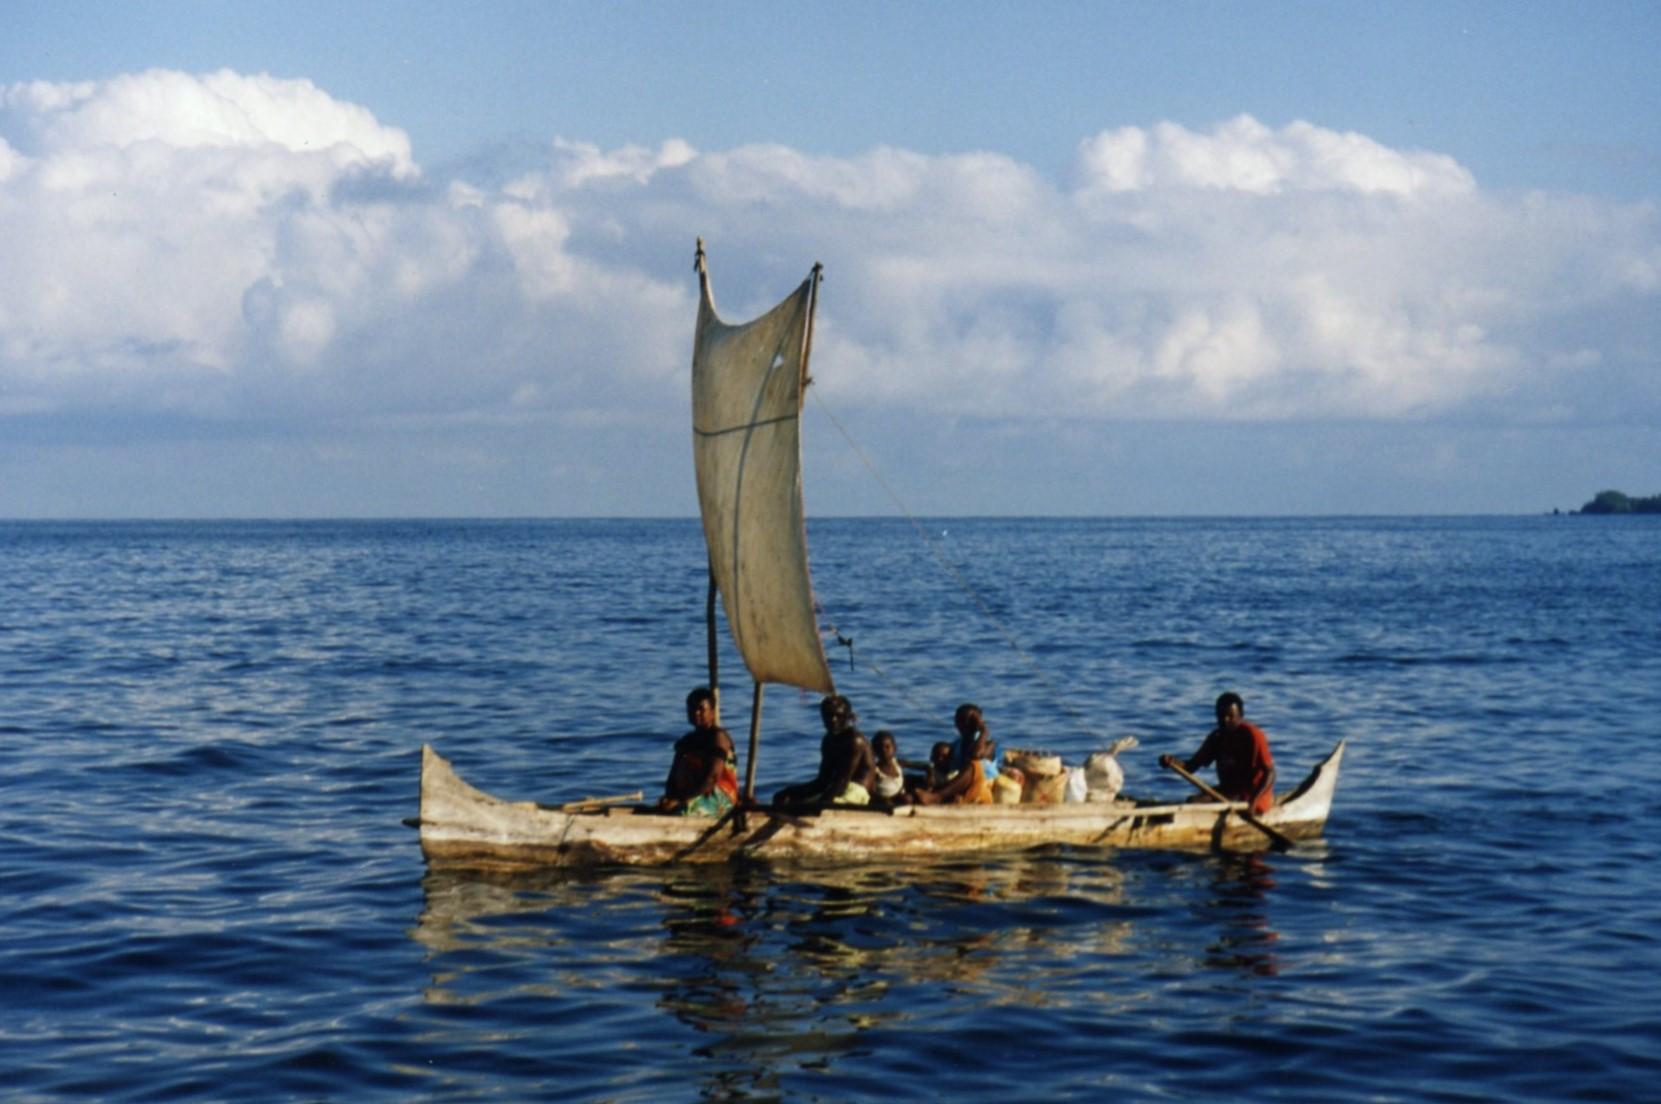 Pirogue with sail, Madagascar